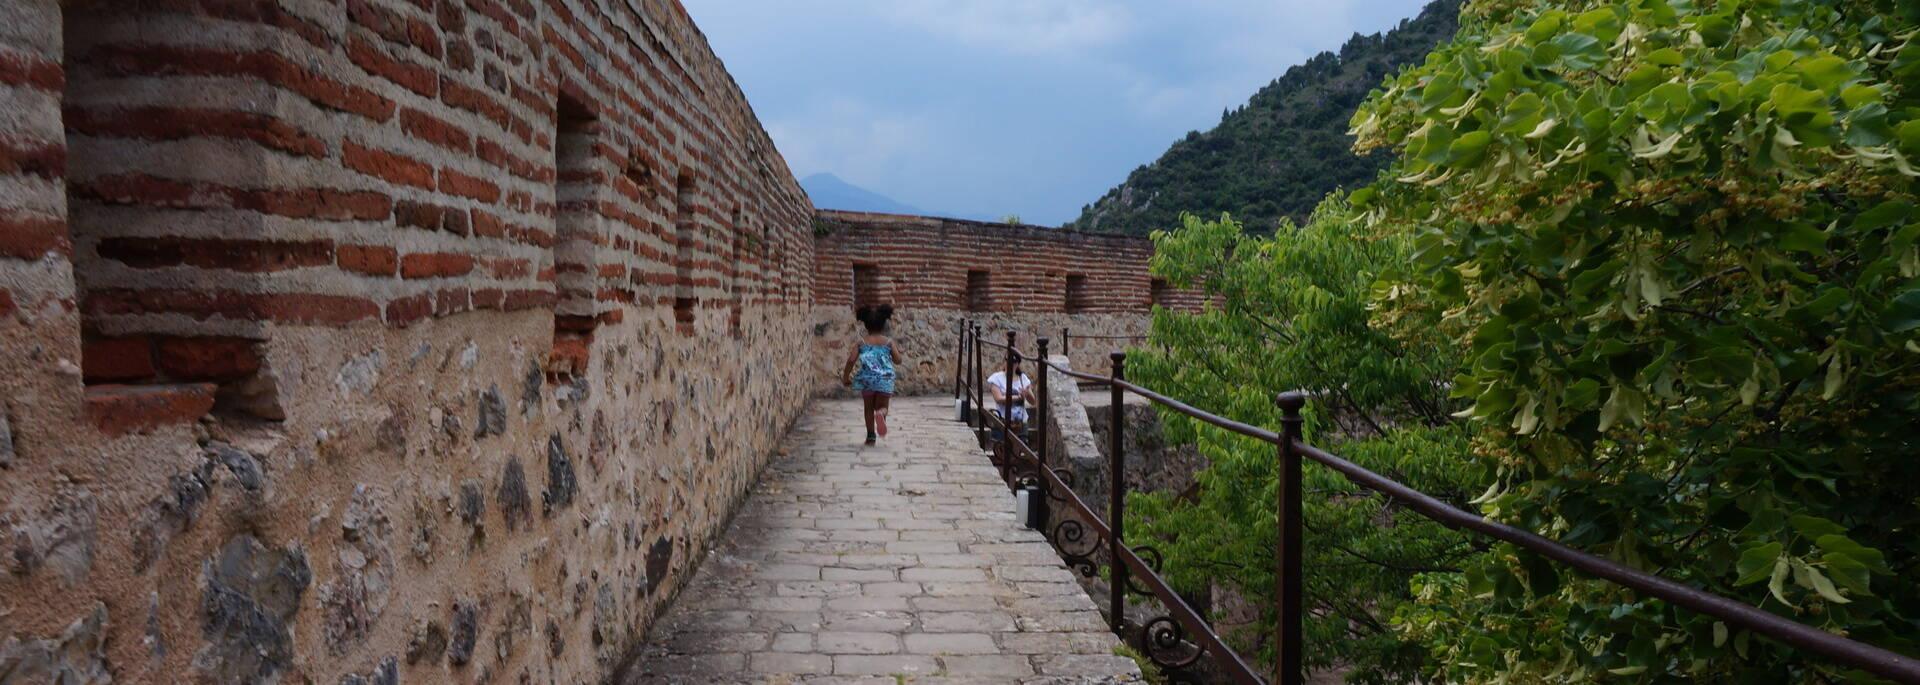 Chemin de ronde du Fort Libéria